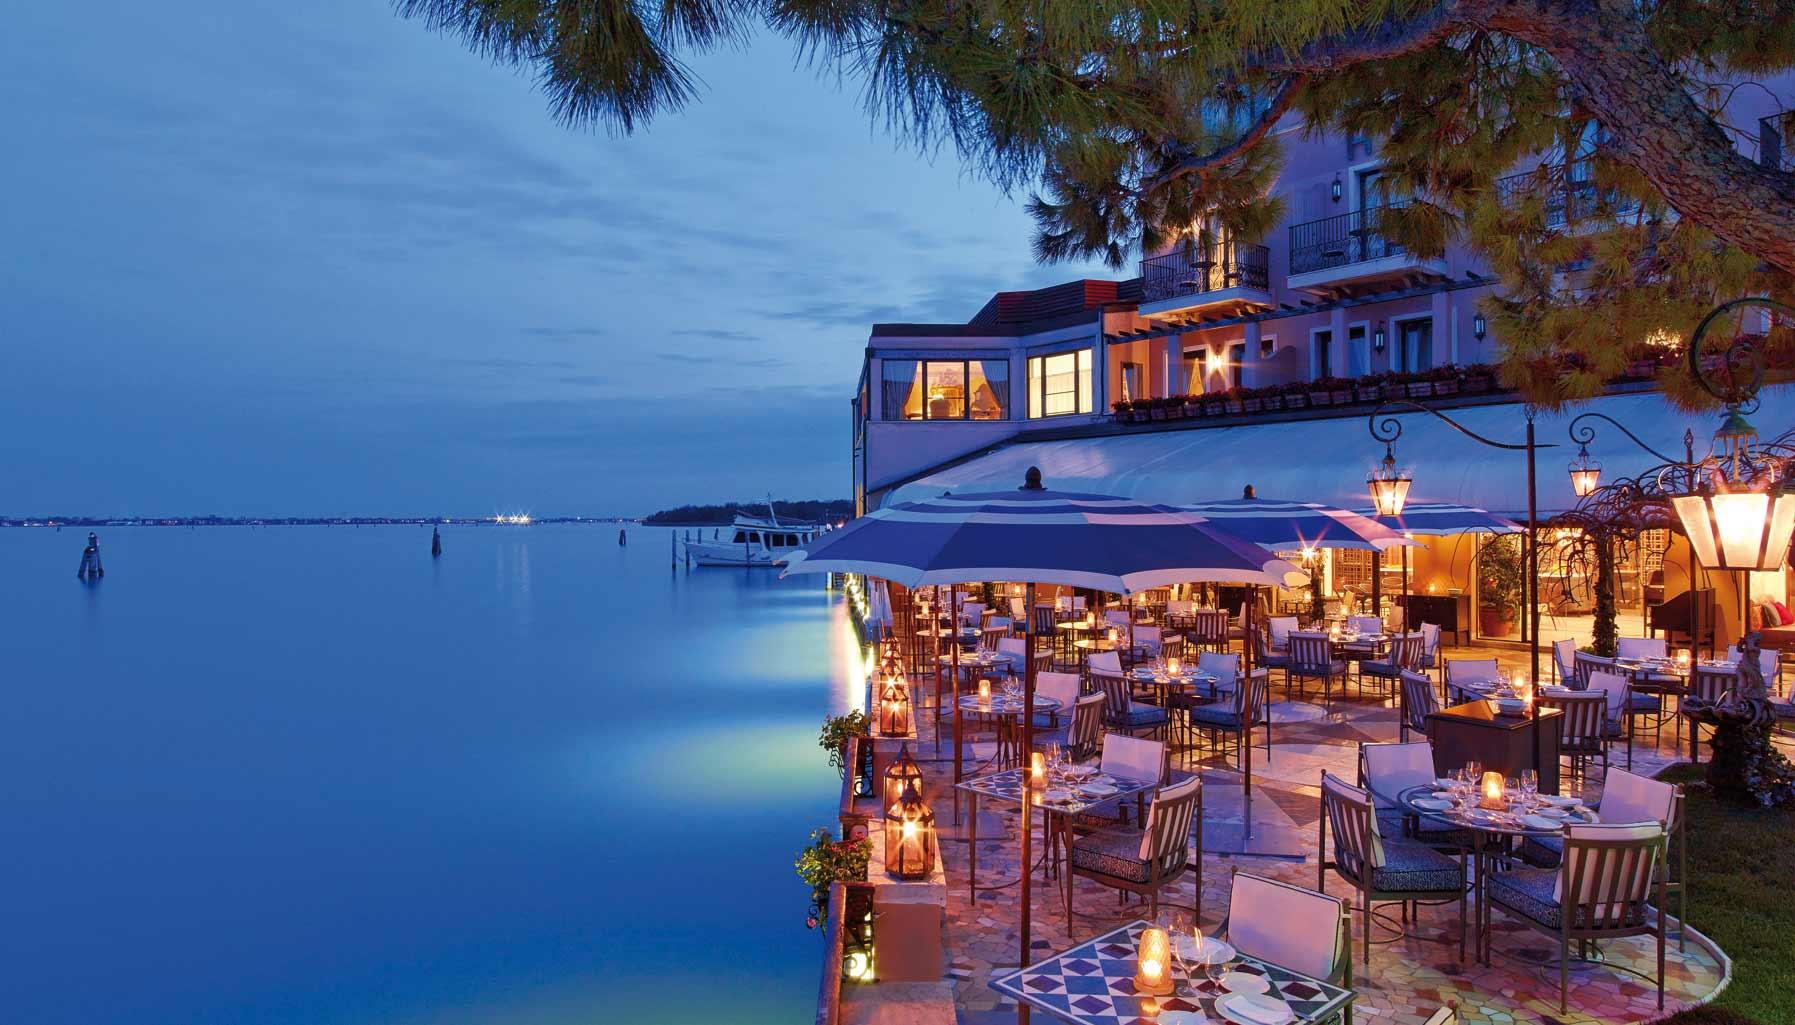 Venice adds Belmond Hotel Cipriani to its treasure chest